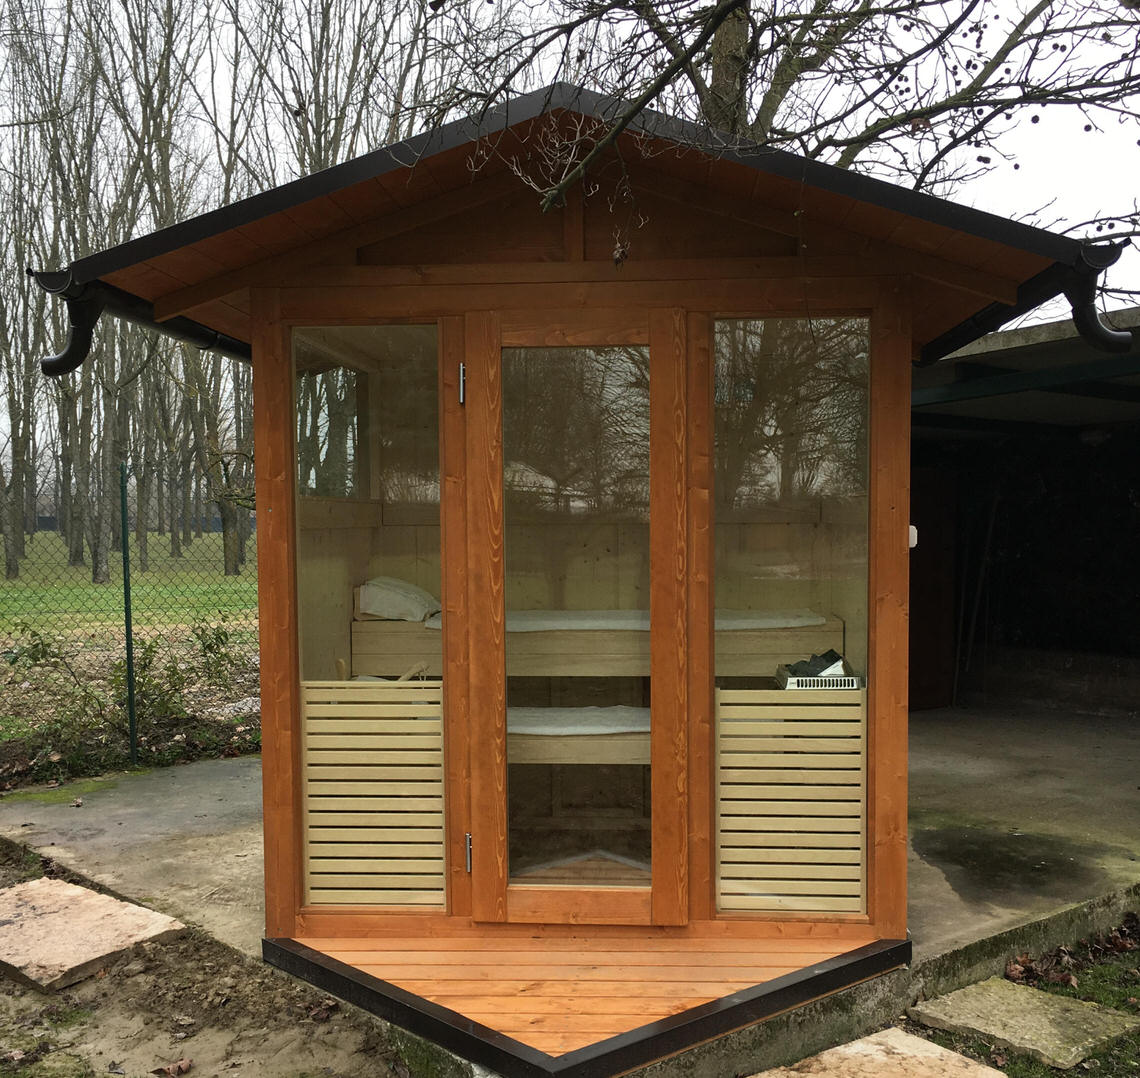 sauna da esterno con tetto a due falde